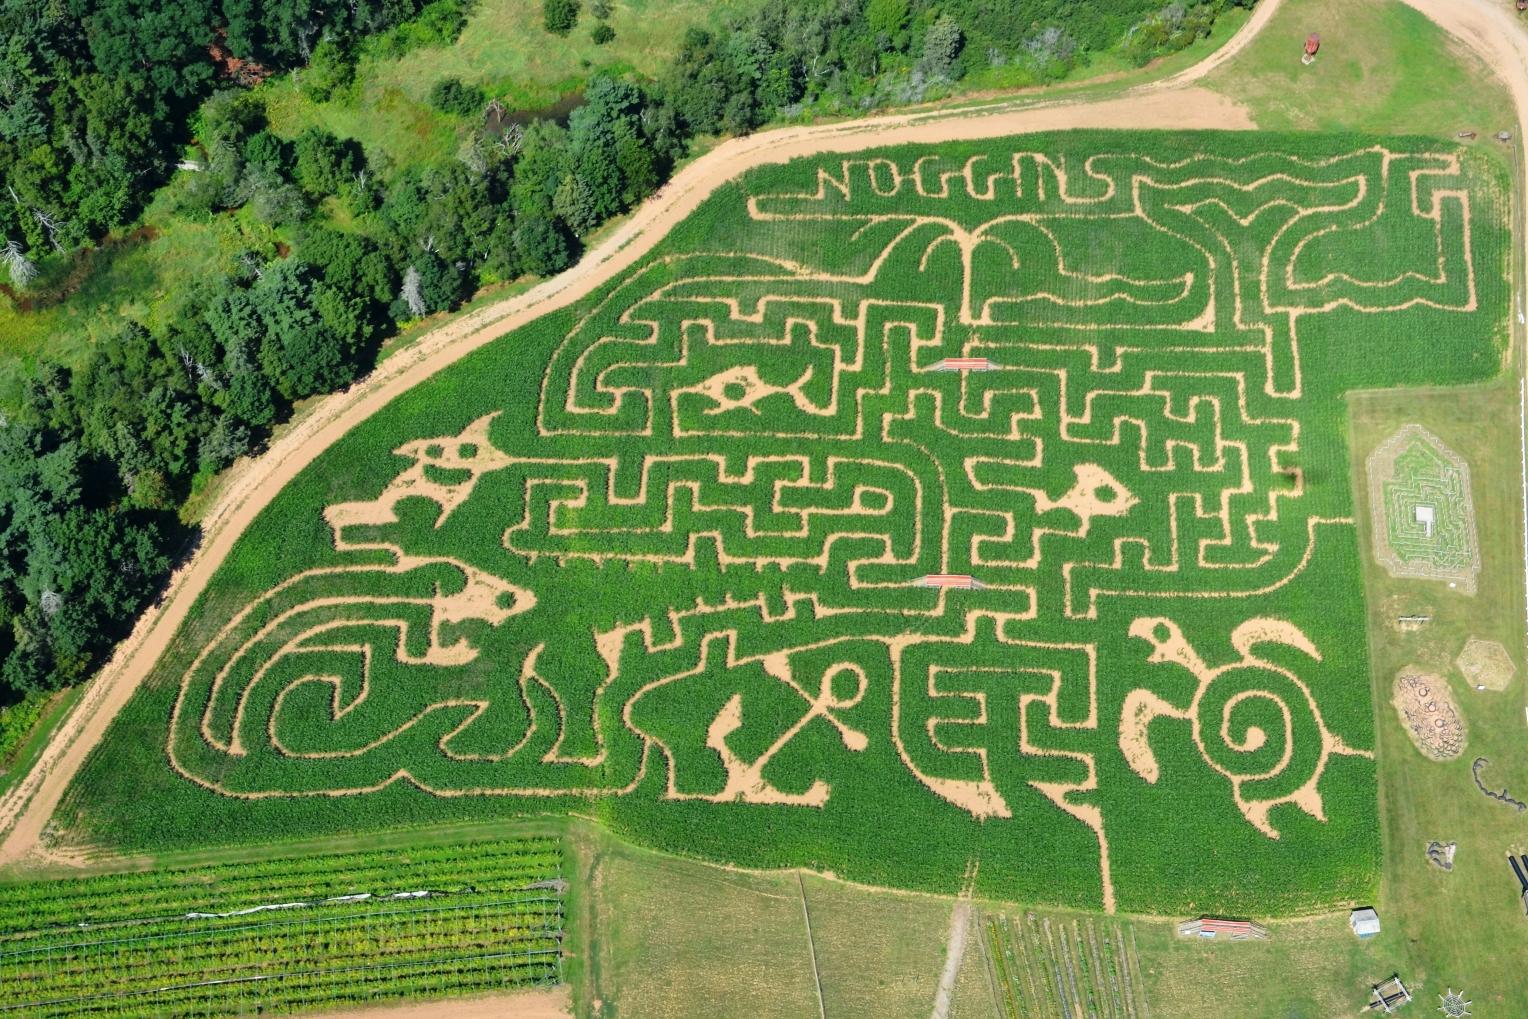 Corn Maze U Pick Noggins Corner Farm Market